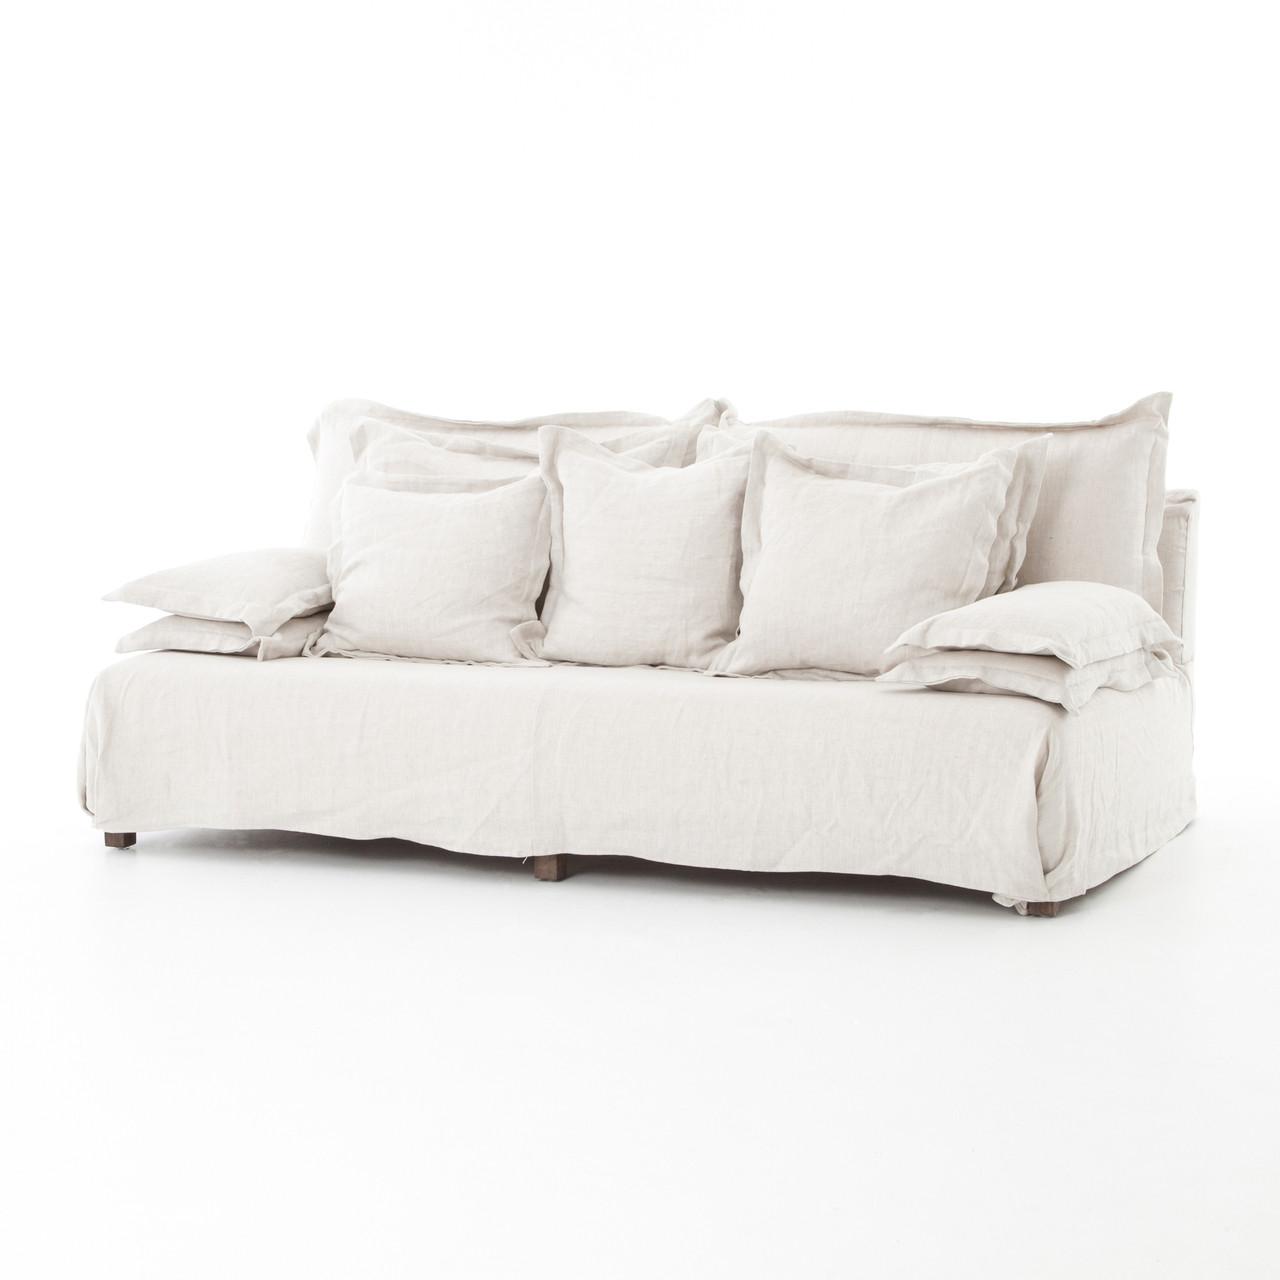 Charmant Esquire Bellevueu0027s 7u0027 Linen Upholstered Sofa